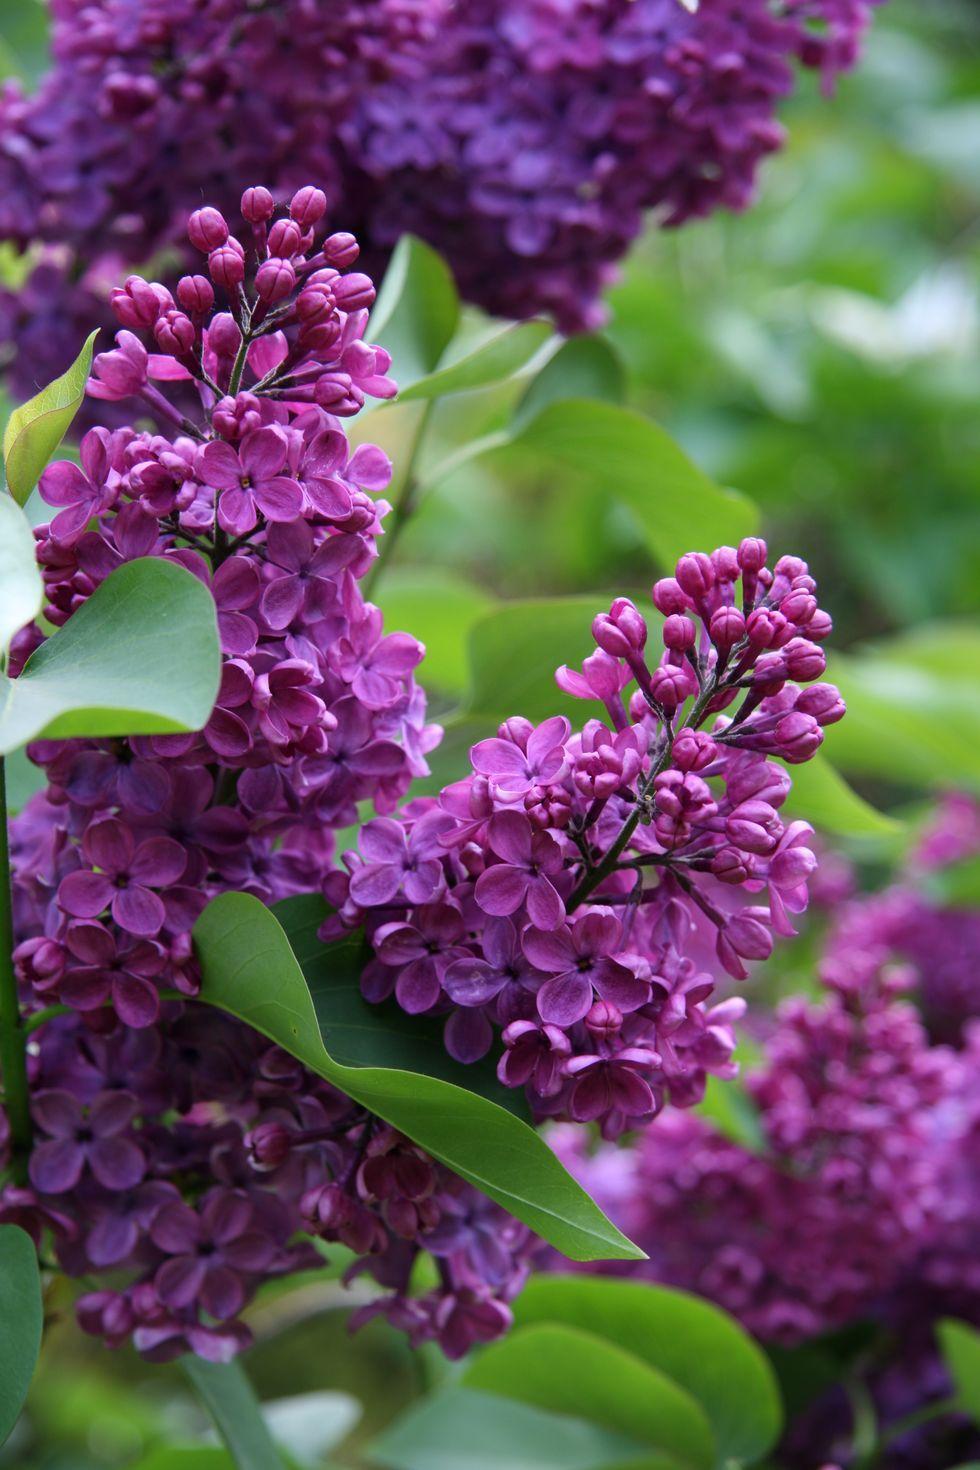 Lila - significados de flores